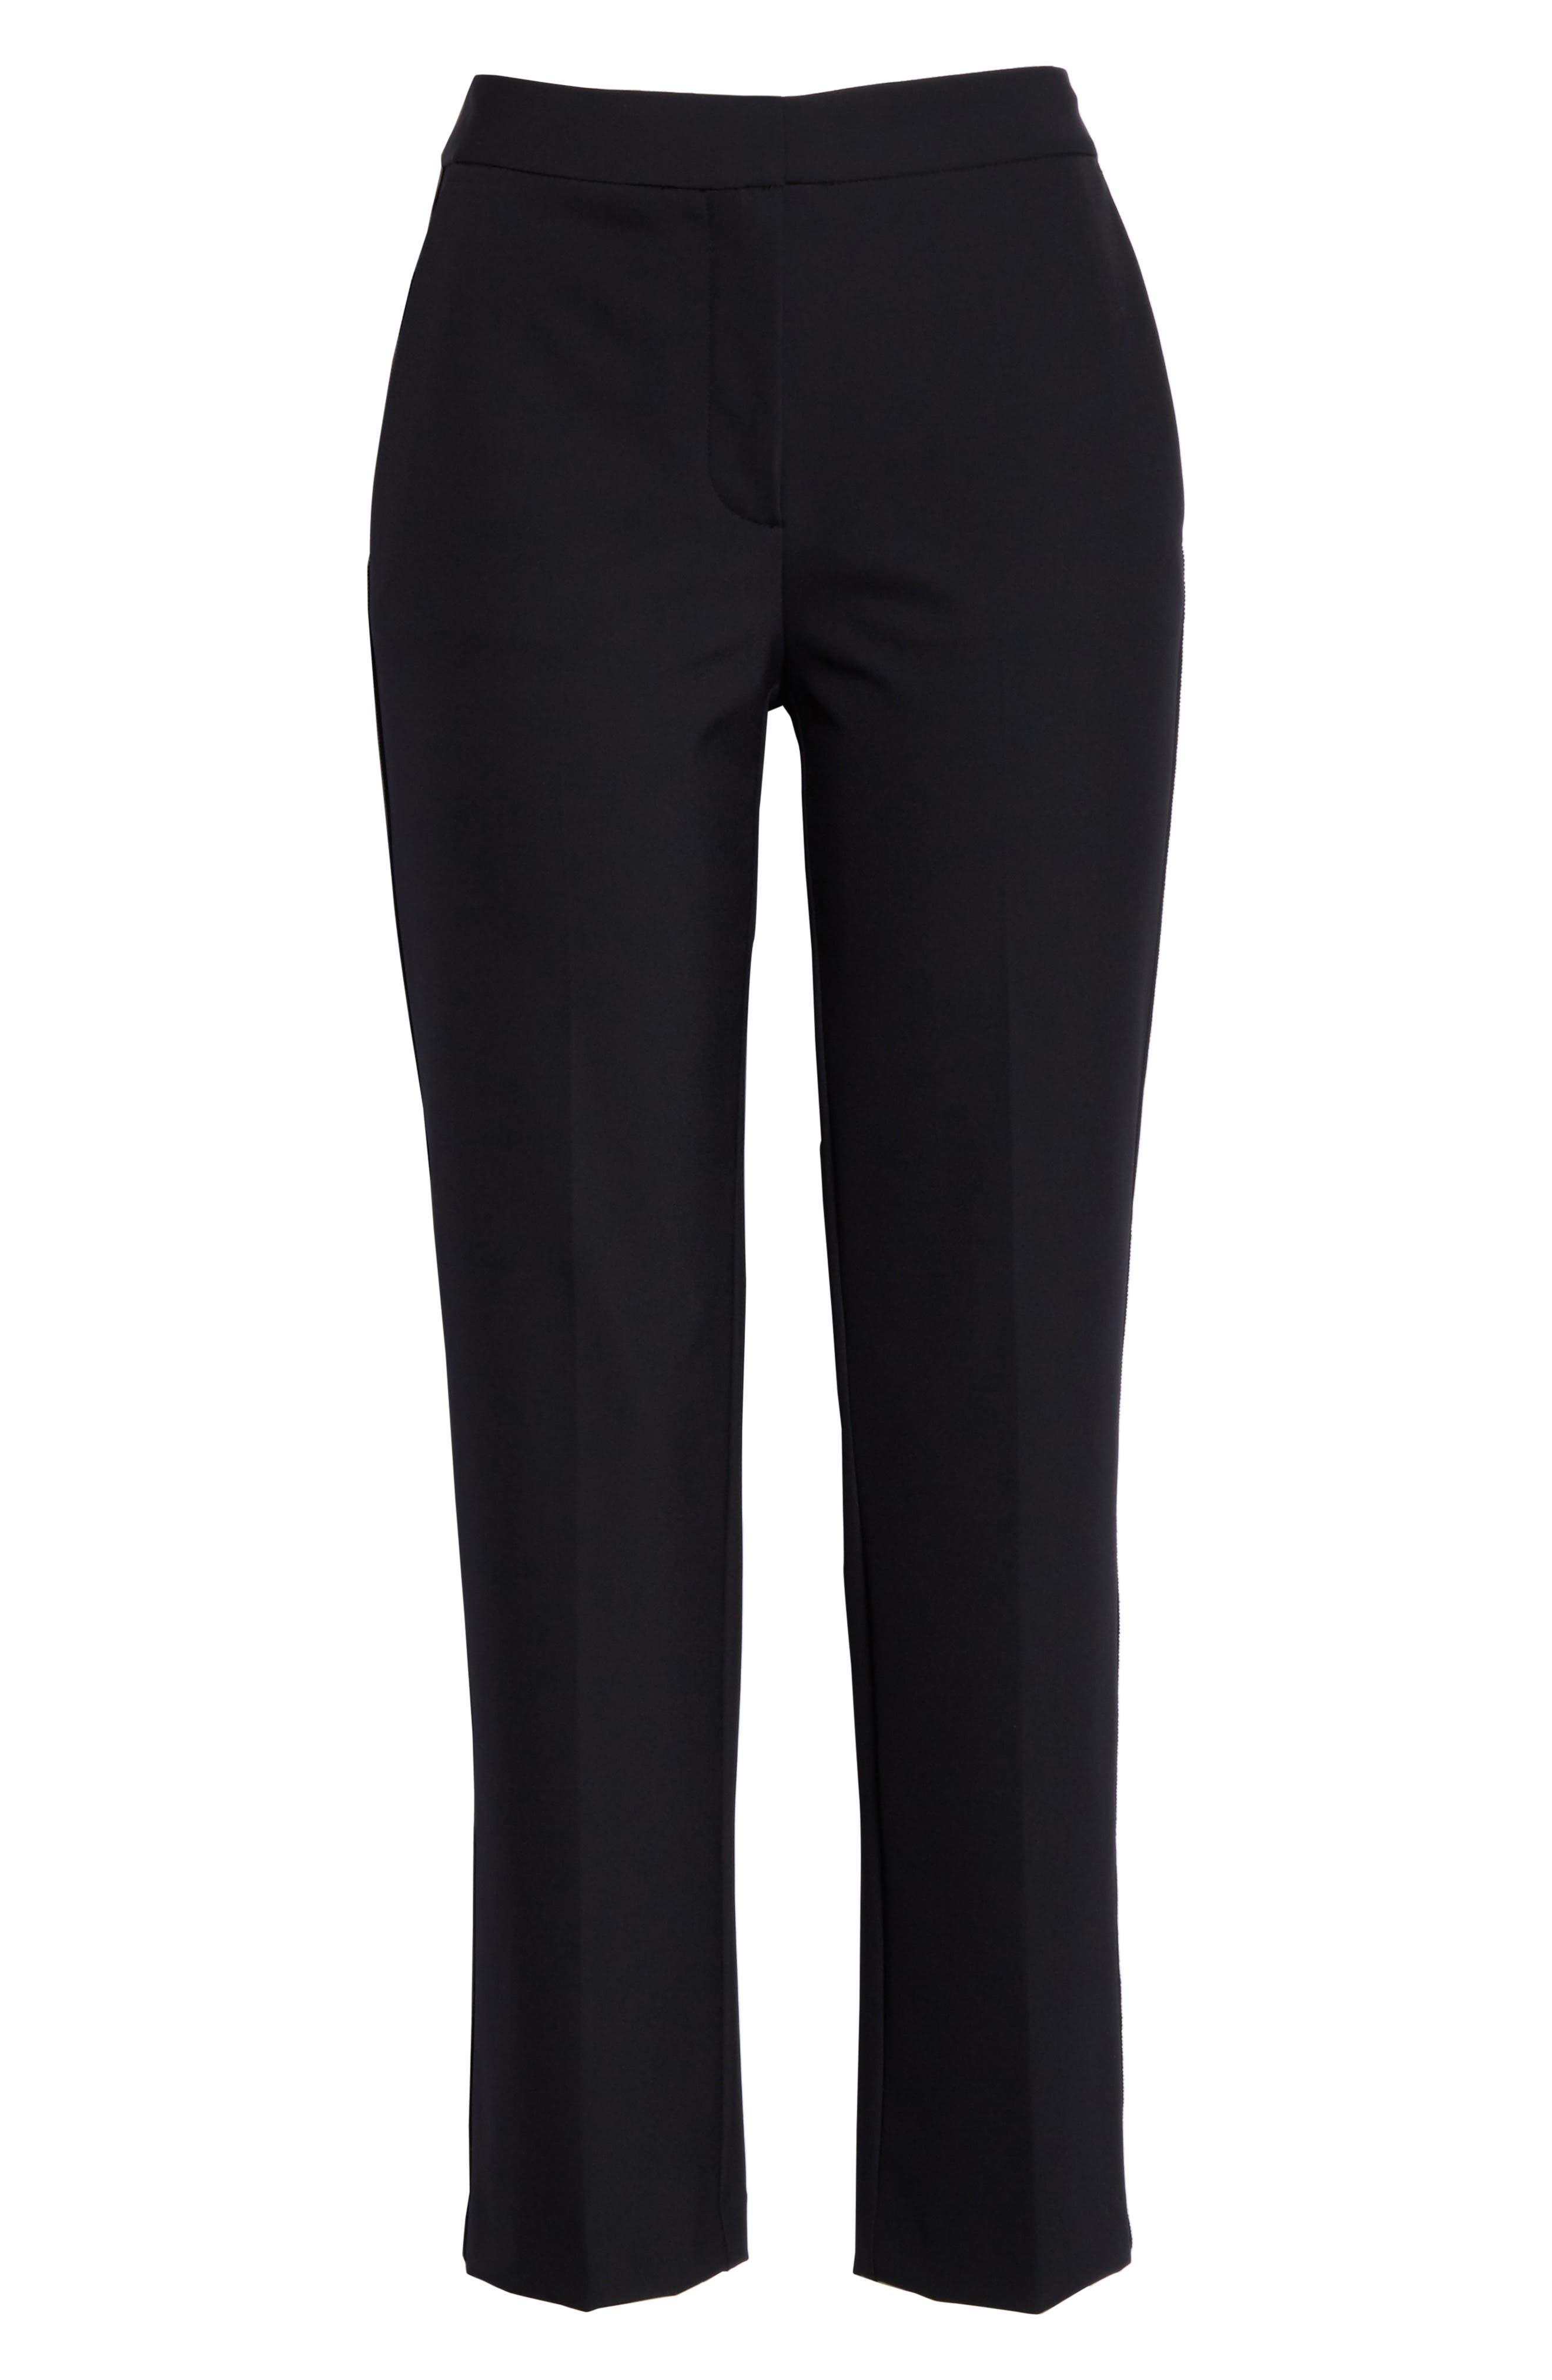 REBECCA TAYLOR, Audra Crop Pants, Alternate thumbnail 7, color, BLACK